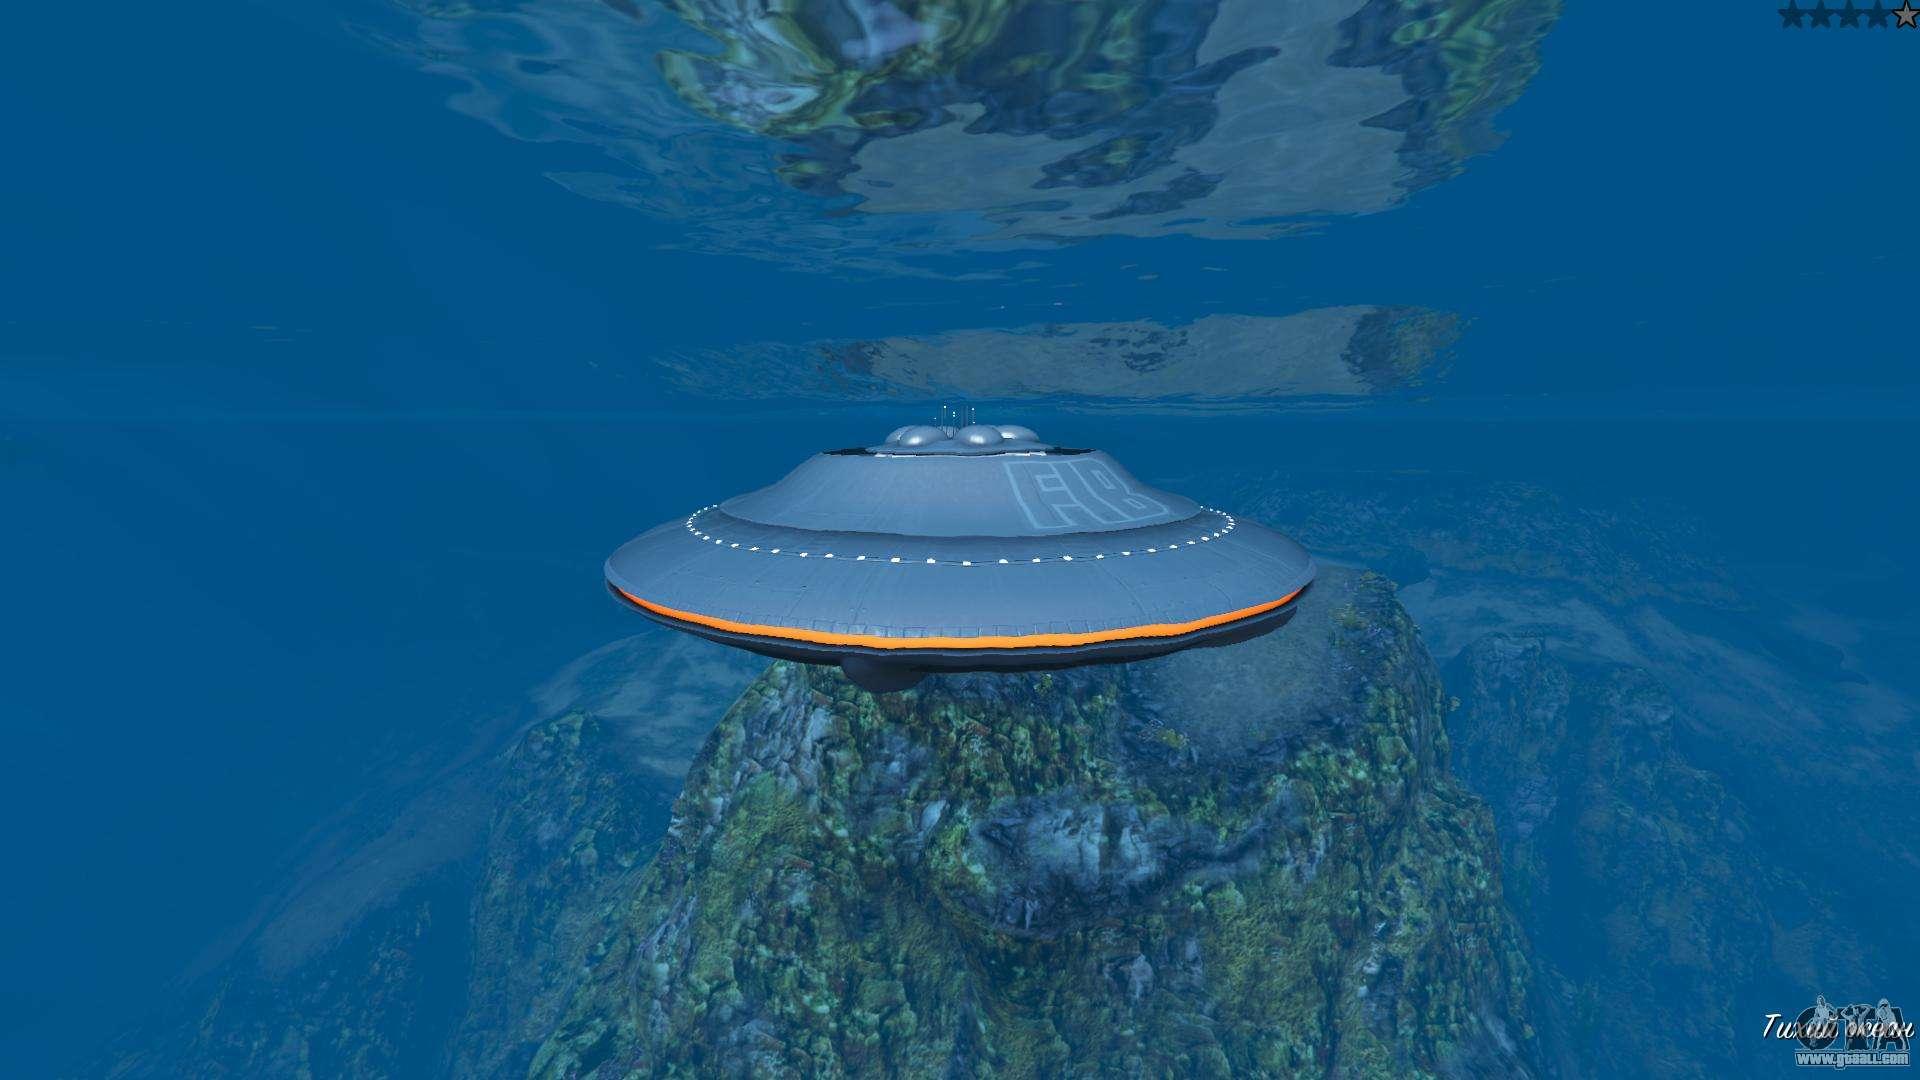 Ufo Mod 1 1 For Gta 5